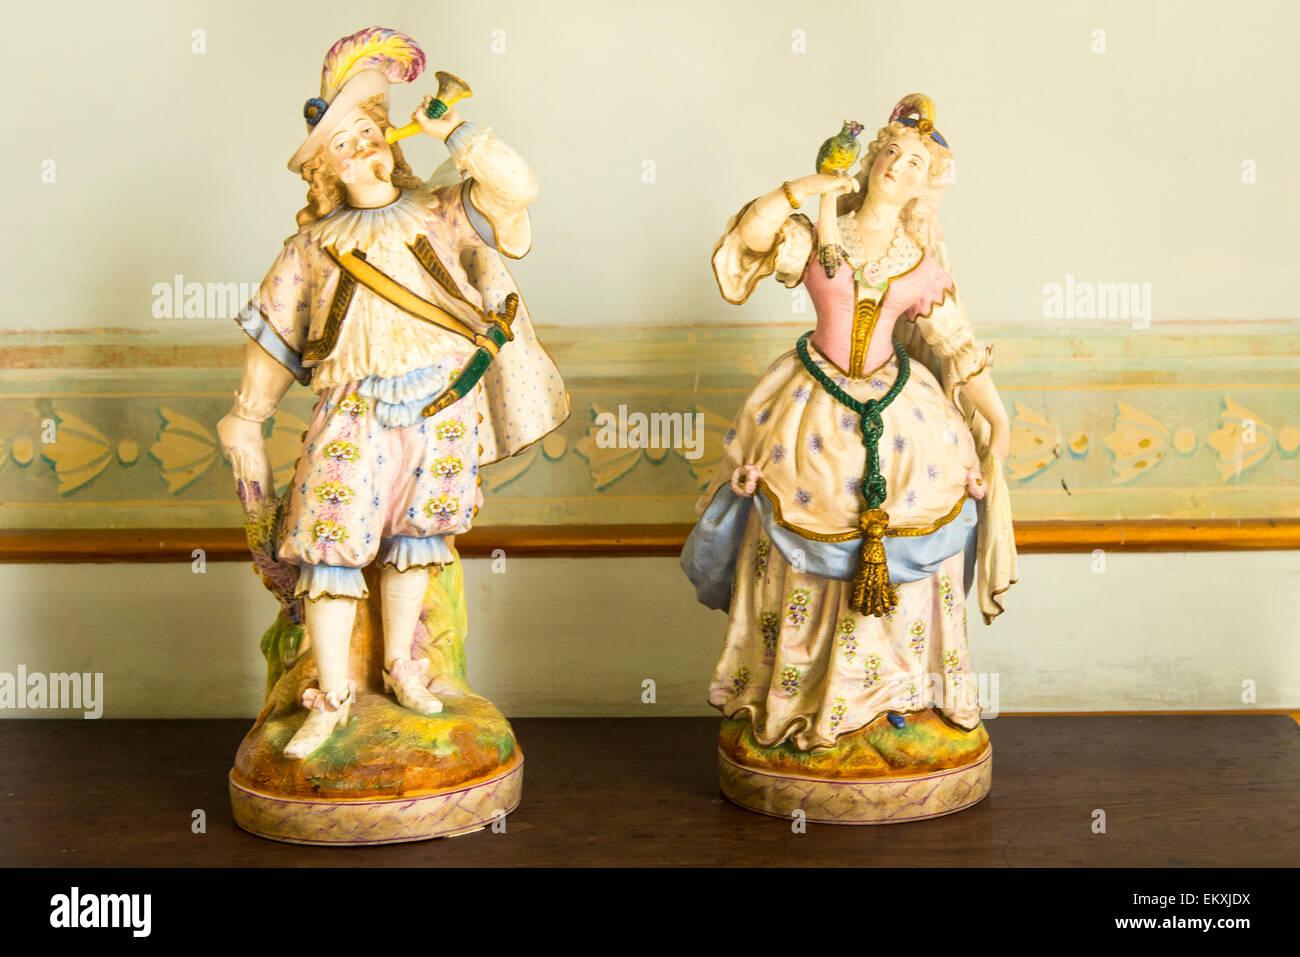 Cuba Trinidad Palacio Cantero Museo Historica Municipal antique two porcelain figures figurines hunter & lady - Stock Image